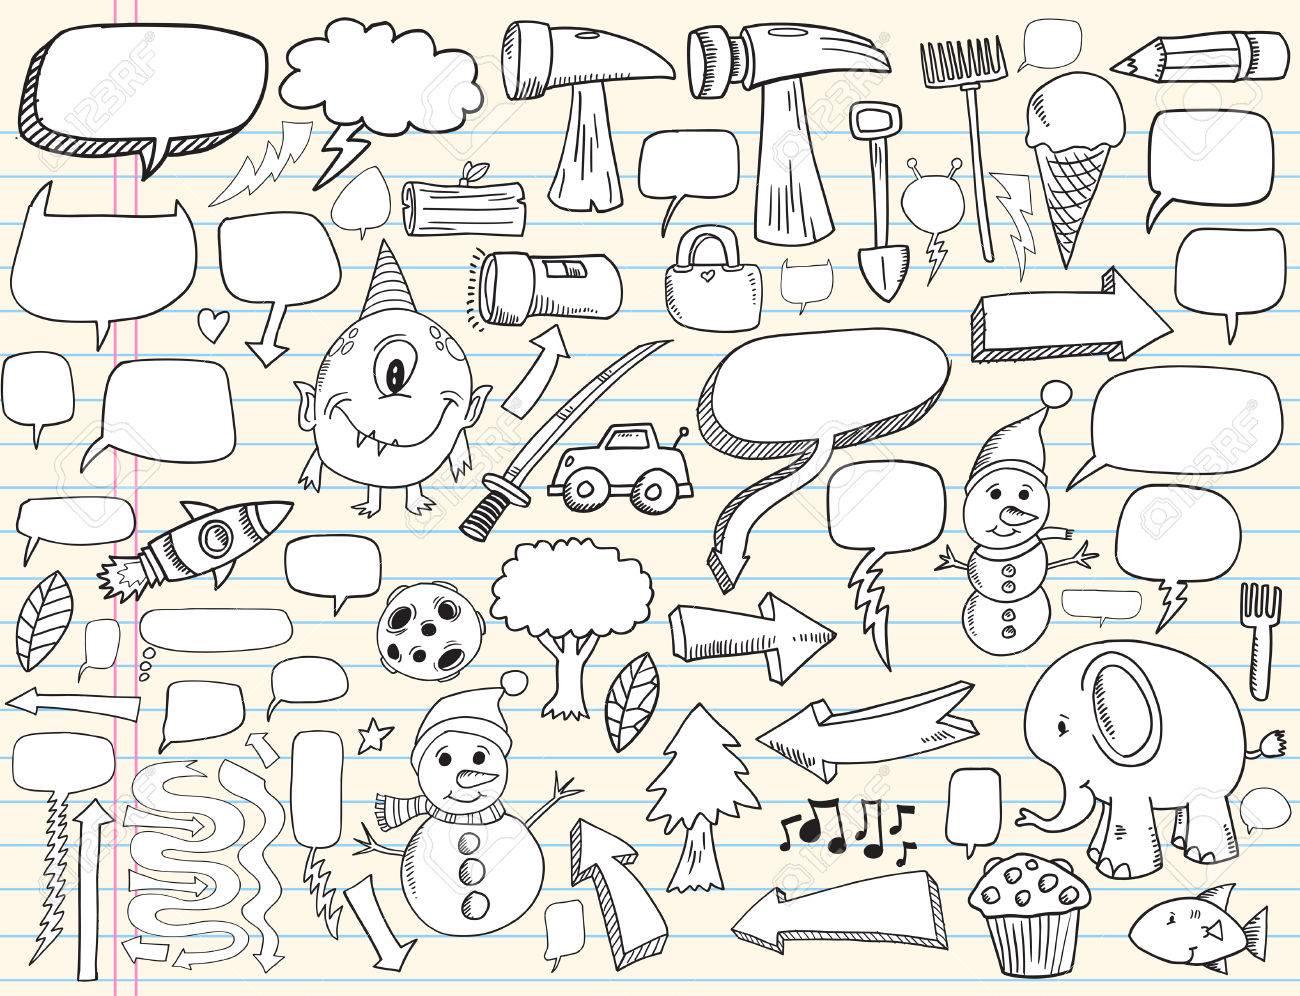 Notebook Doodle Speech Bubble Design Elements Mega Illustration Set - 7261094